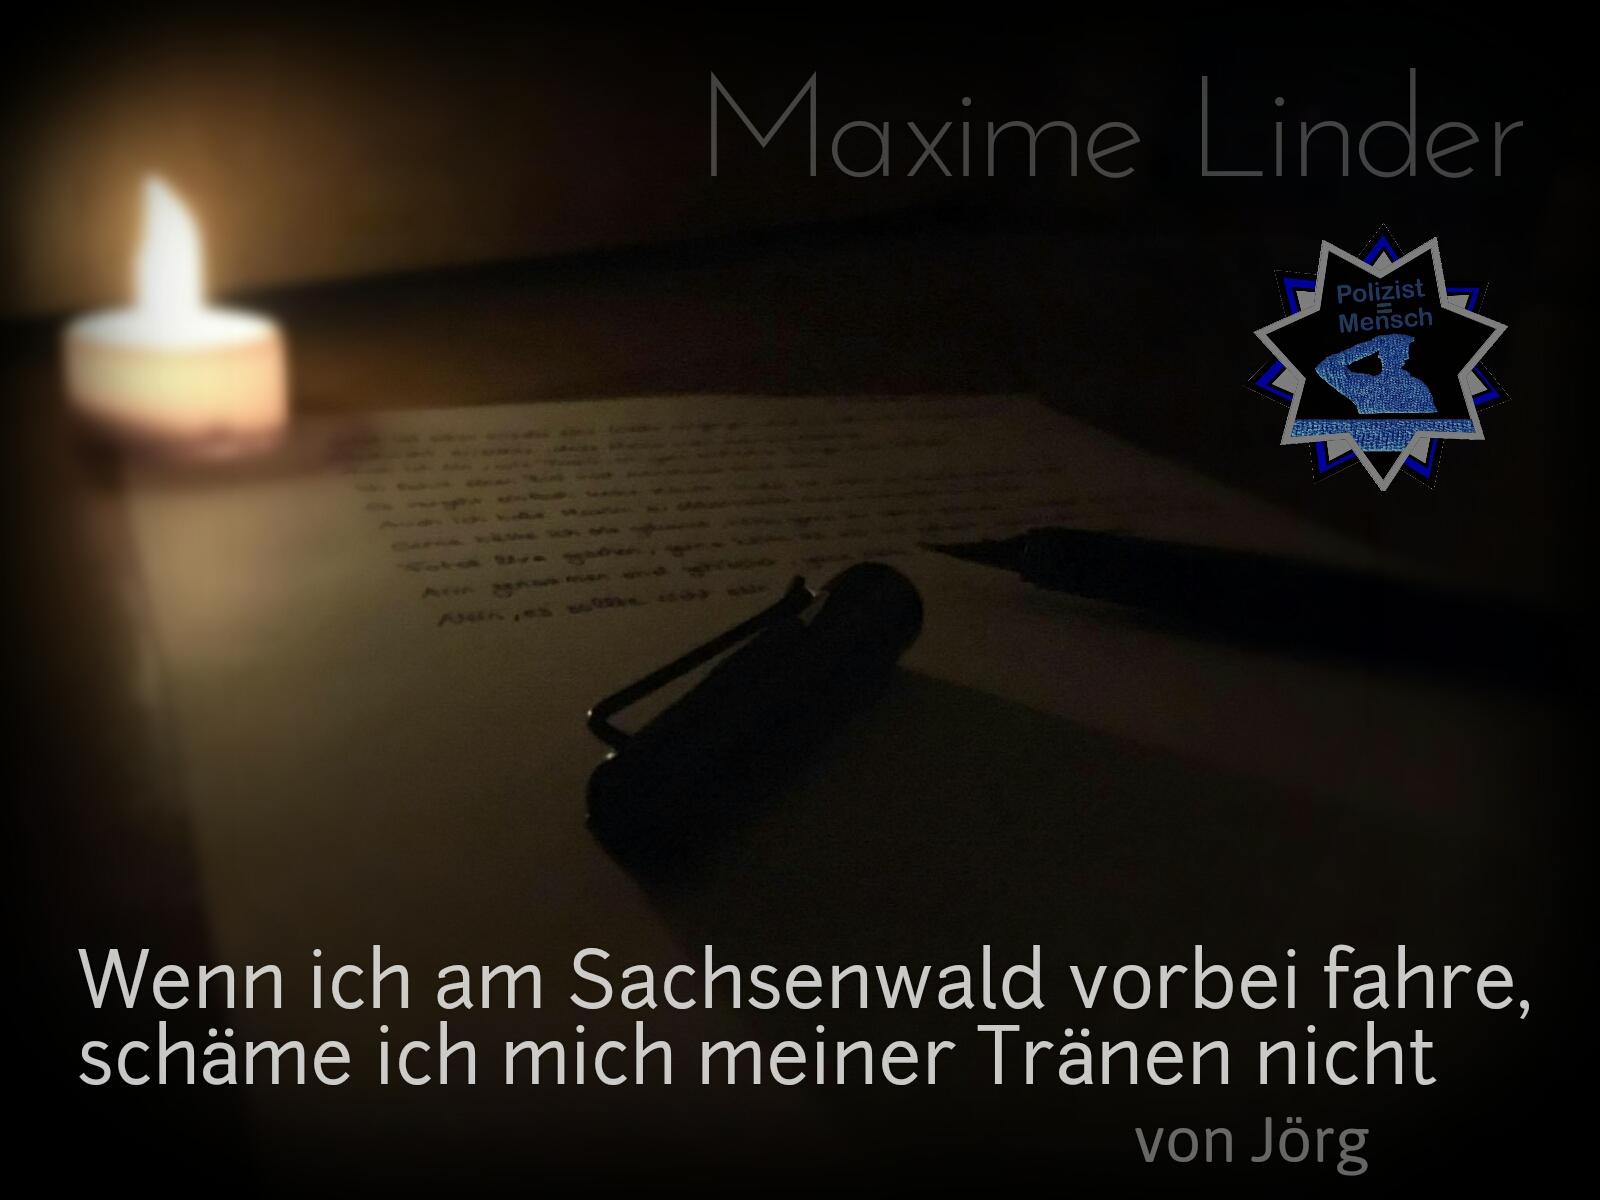 Maxime Linder